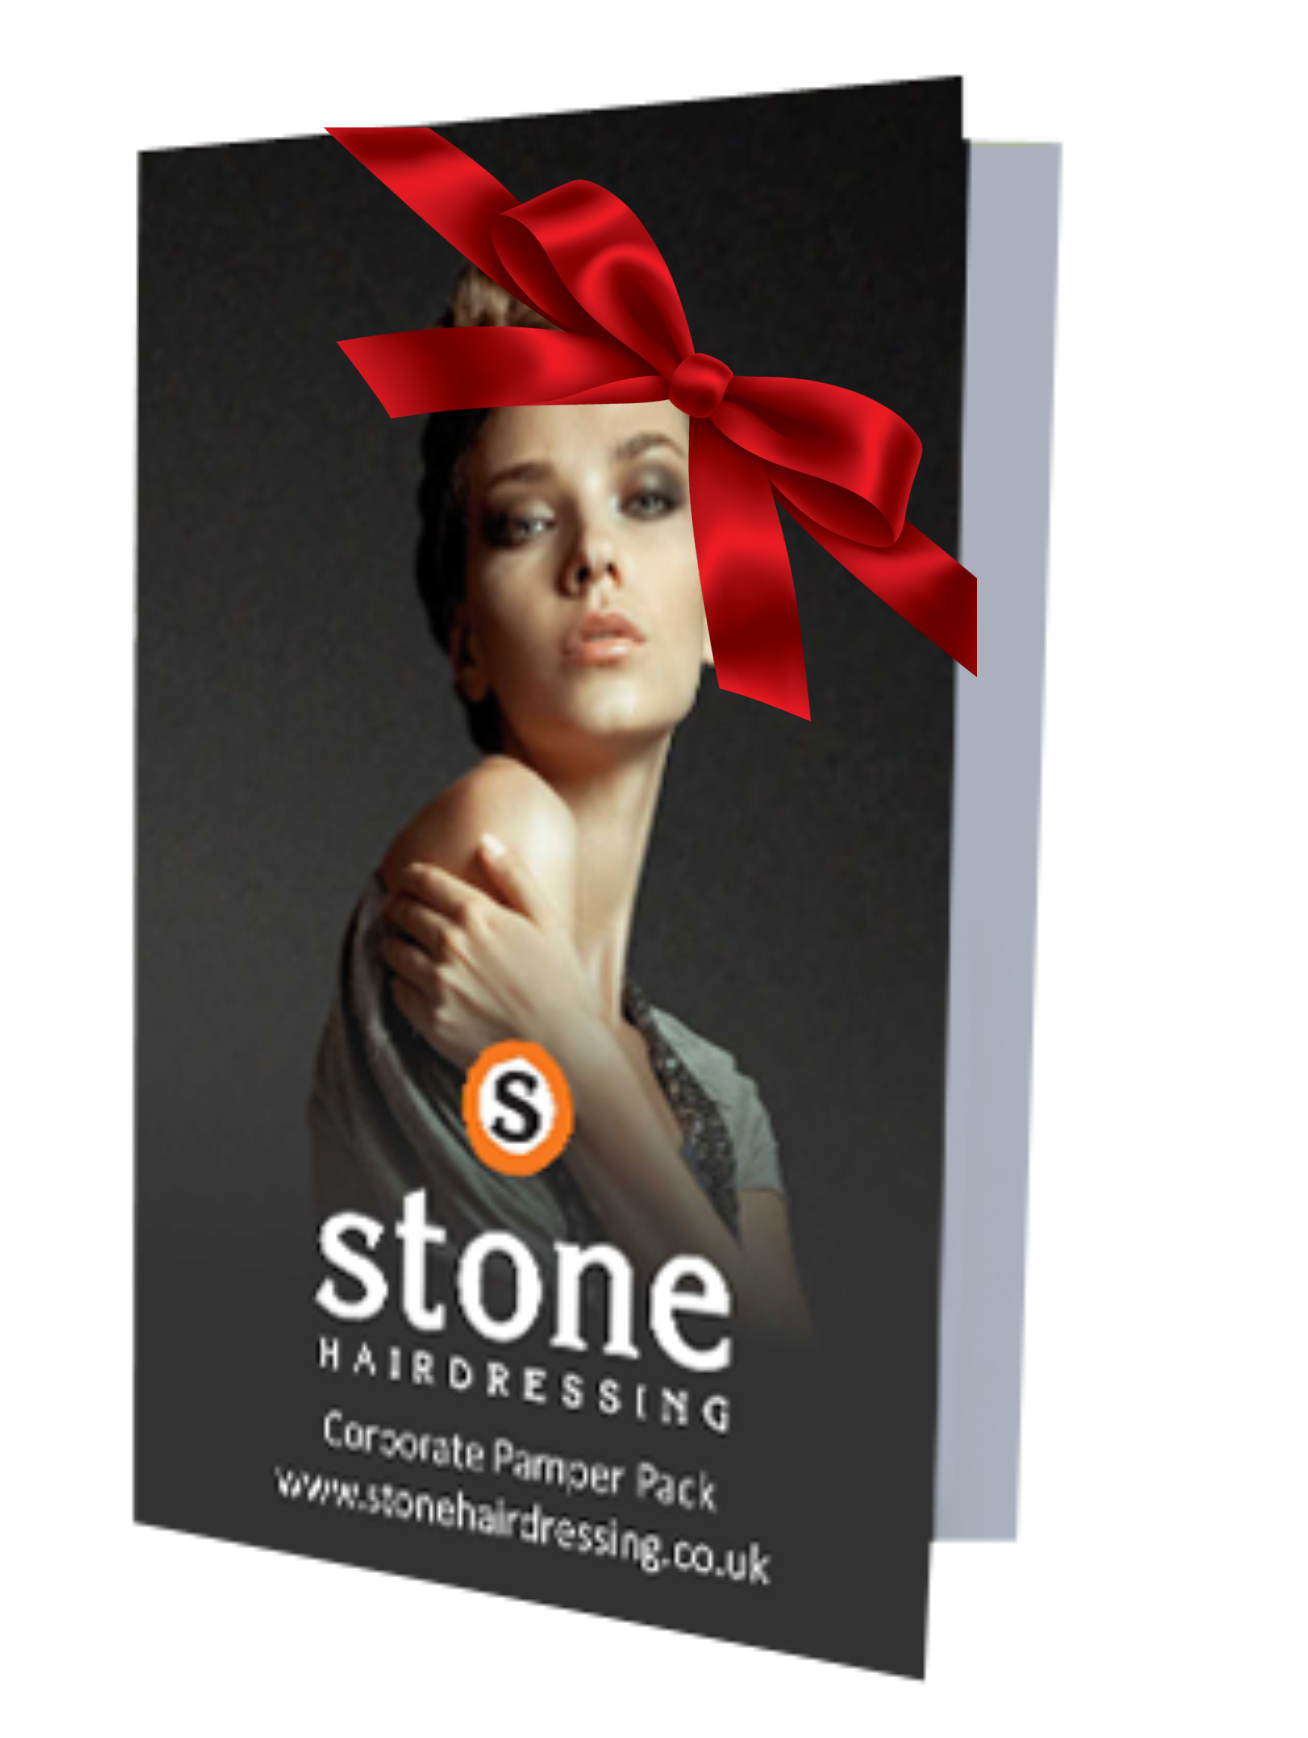 hairdresser offers Stone Hairdressing